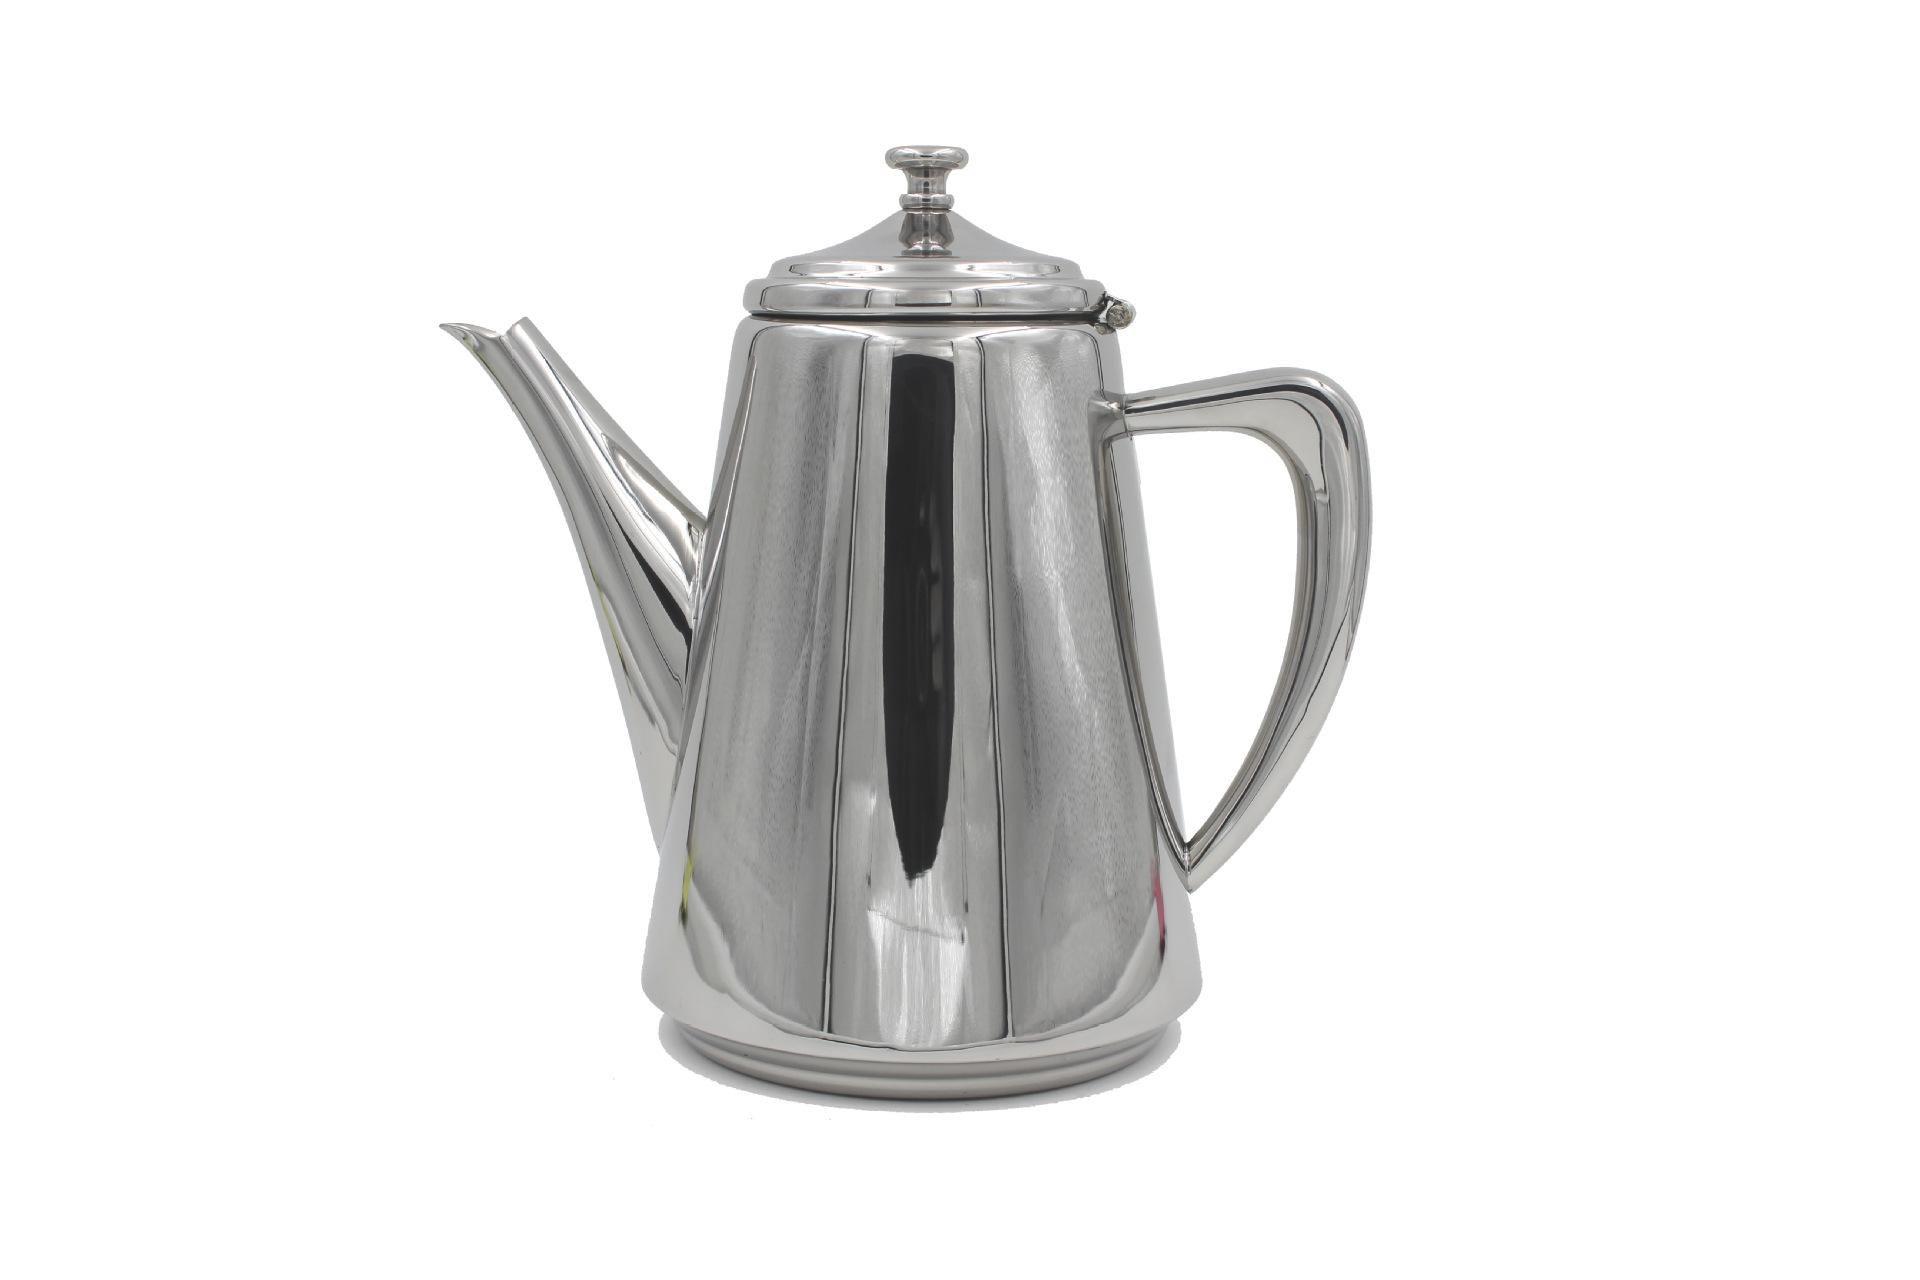 Stainless steel kettle Customizable Best Sellers